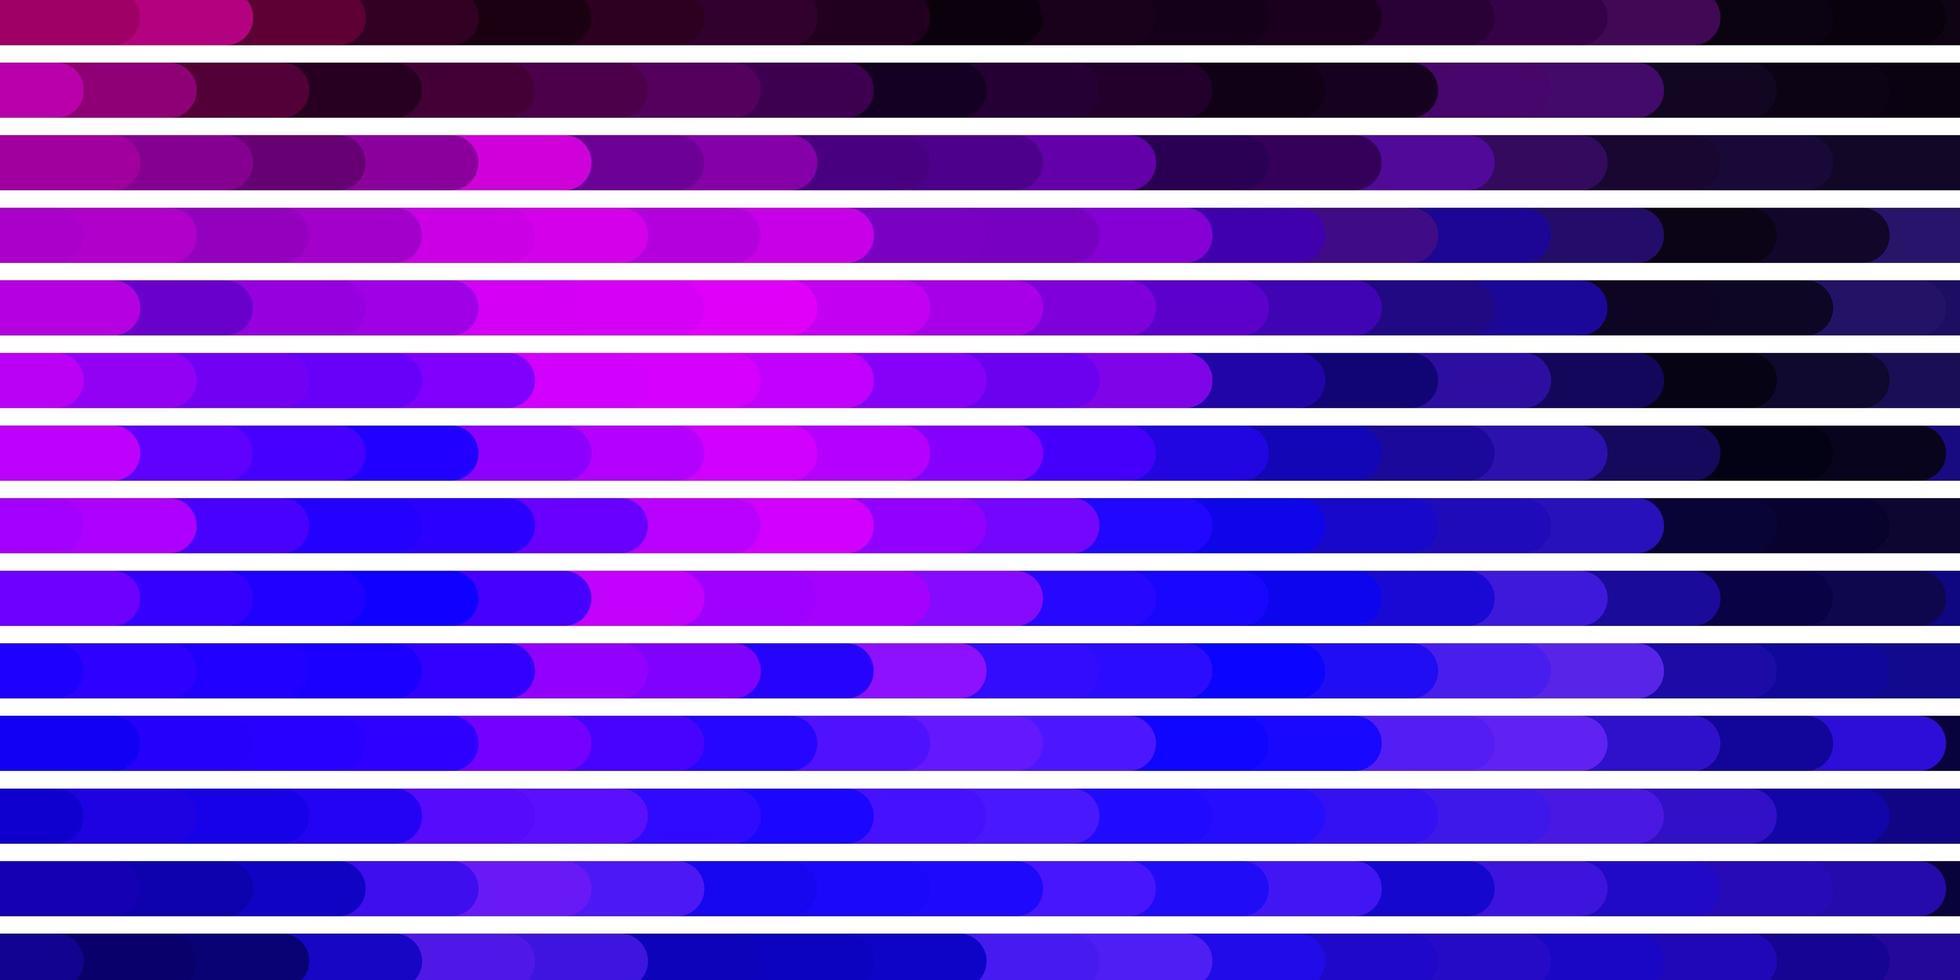 dunkelviolette, rosa Vektorschablone mit Linien. vektor